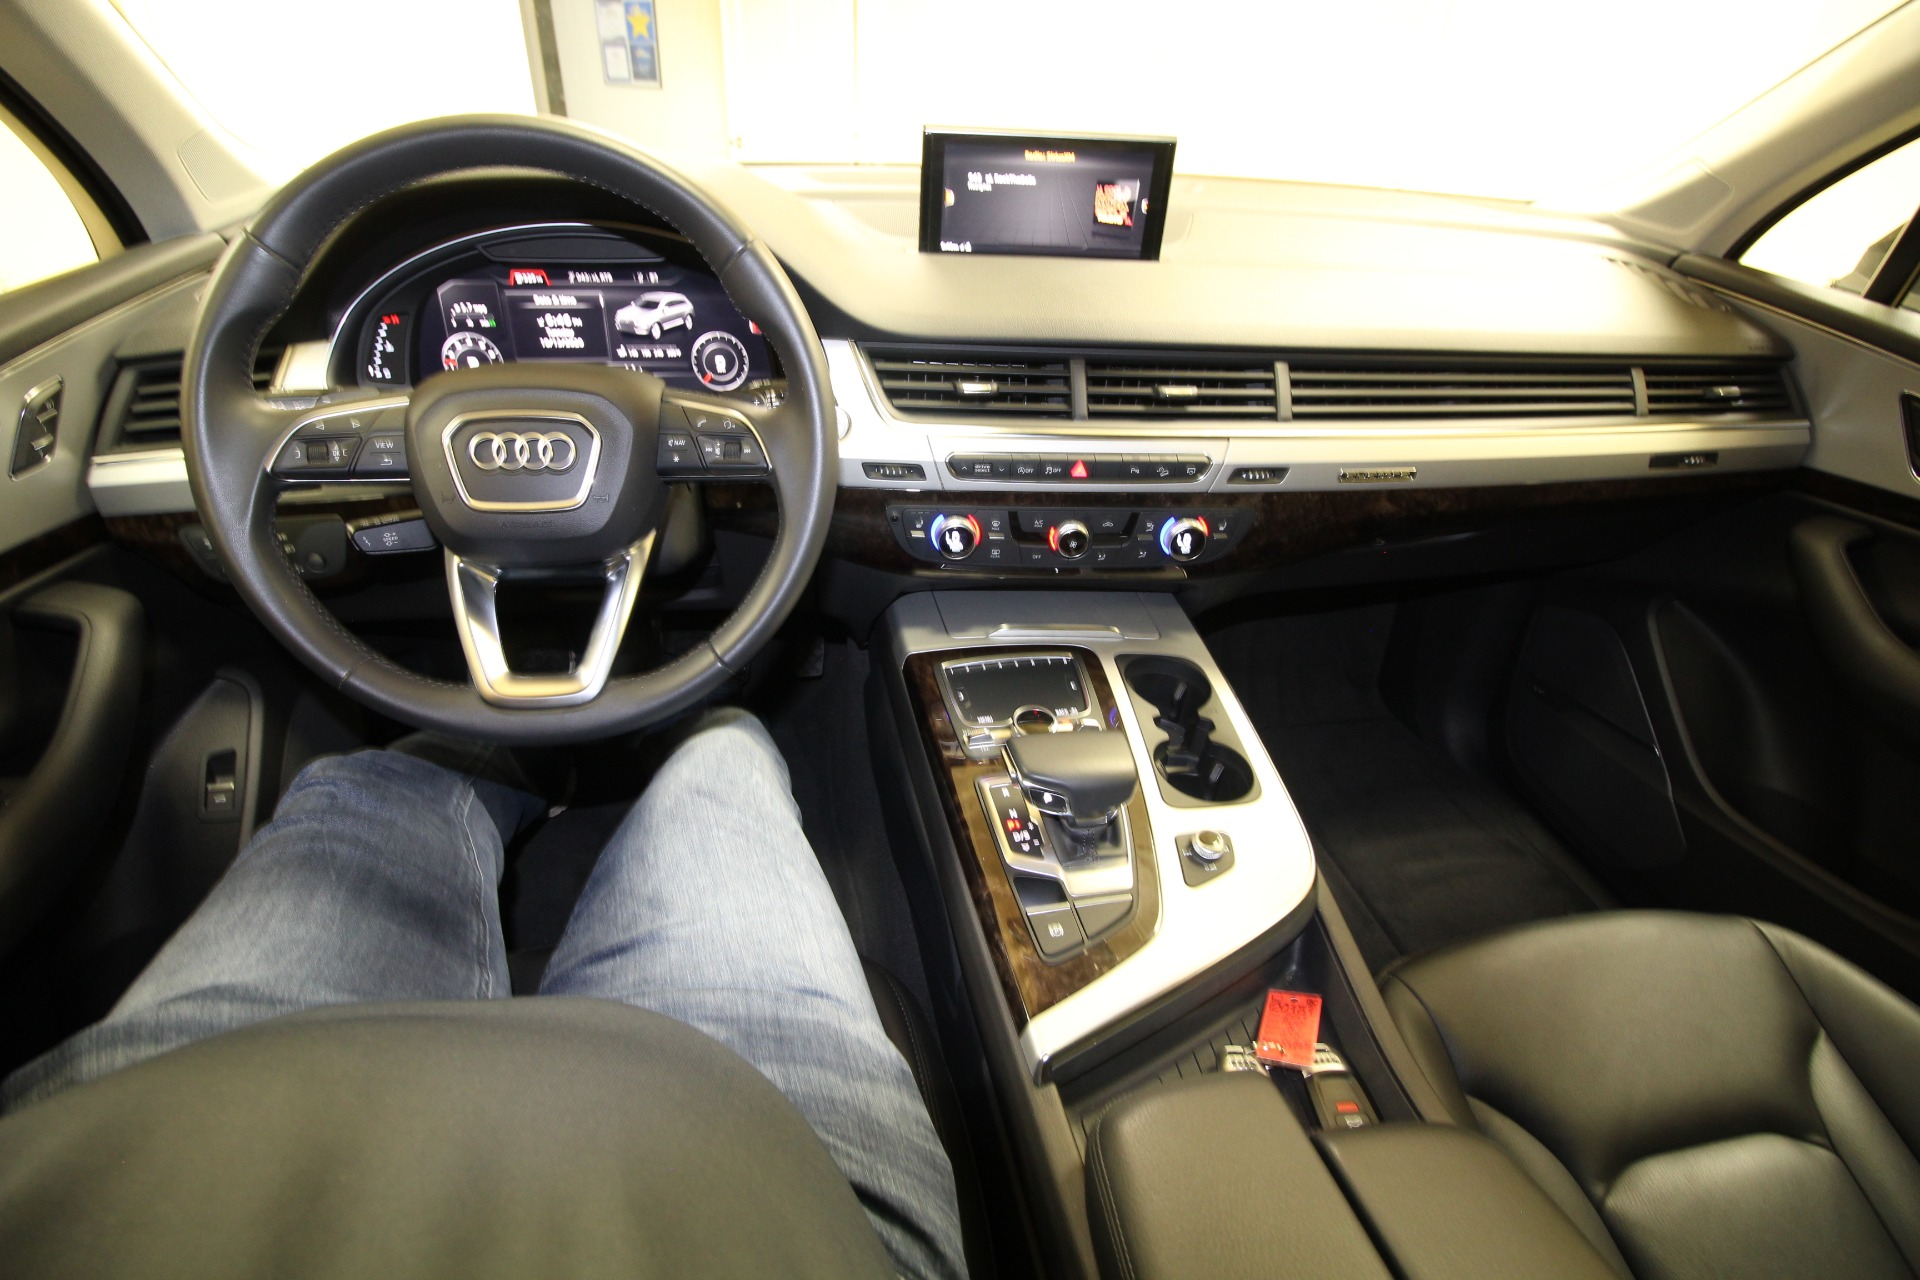 Used 2019 Audi Q7 2.0 PREMIUM PLUS QUATTRO SUPER LOADED W/OPTIONS LOW MILES 1 OWNER | Albany, NY